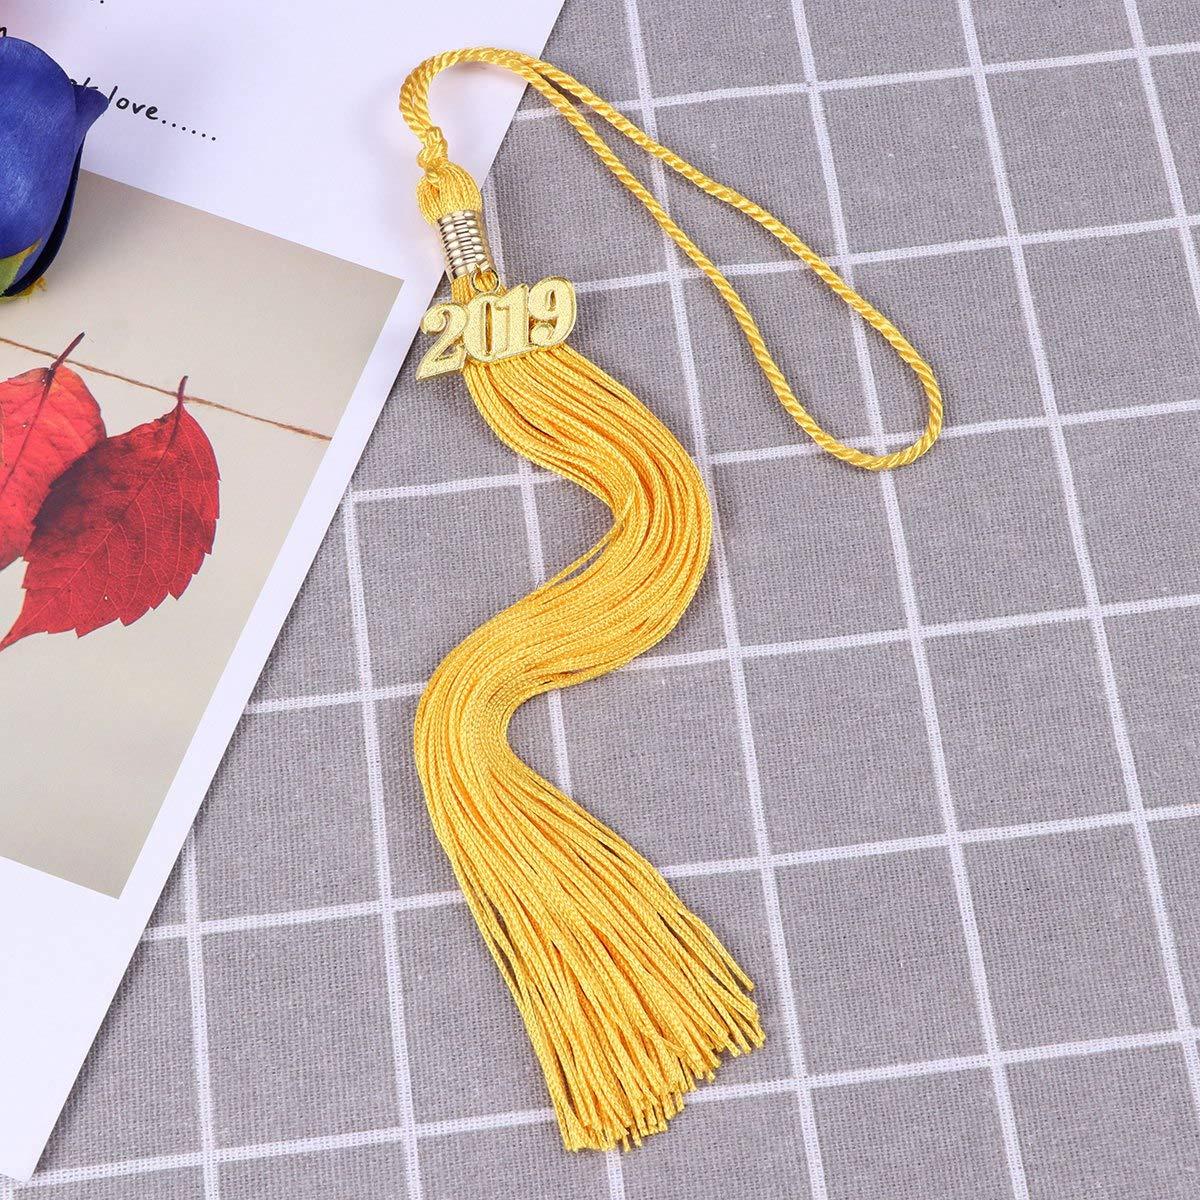 Yellow TOYANDONA Tassel 2019 Graduation Hat Number Craft Tassel Hanging Pendent for Bachelor Master Doctor Cap